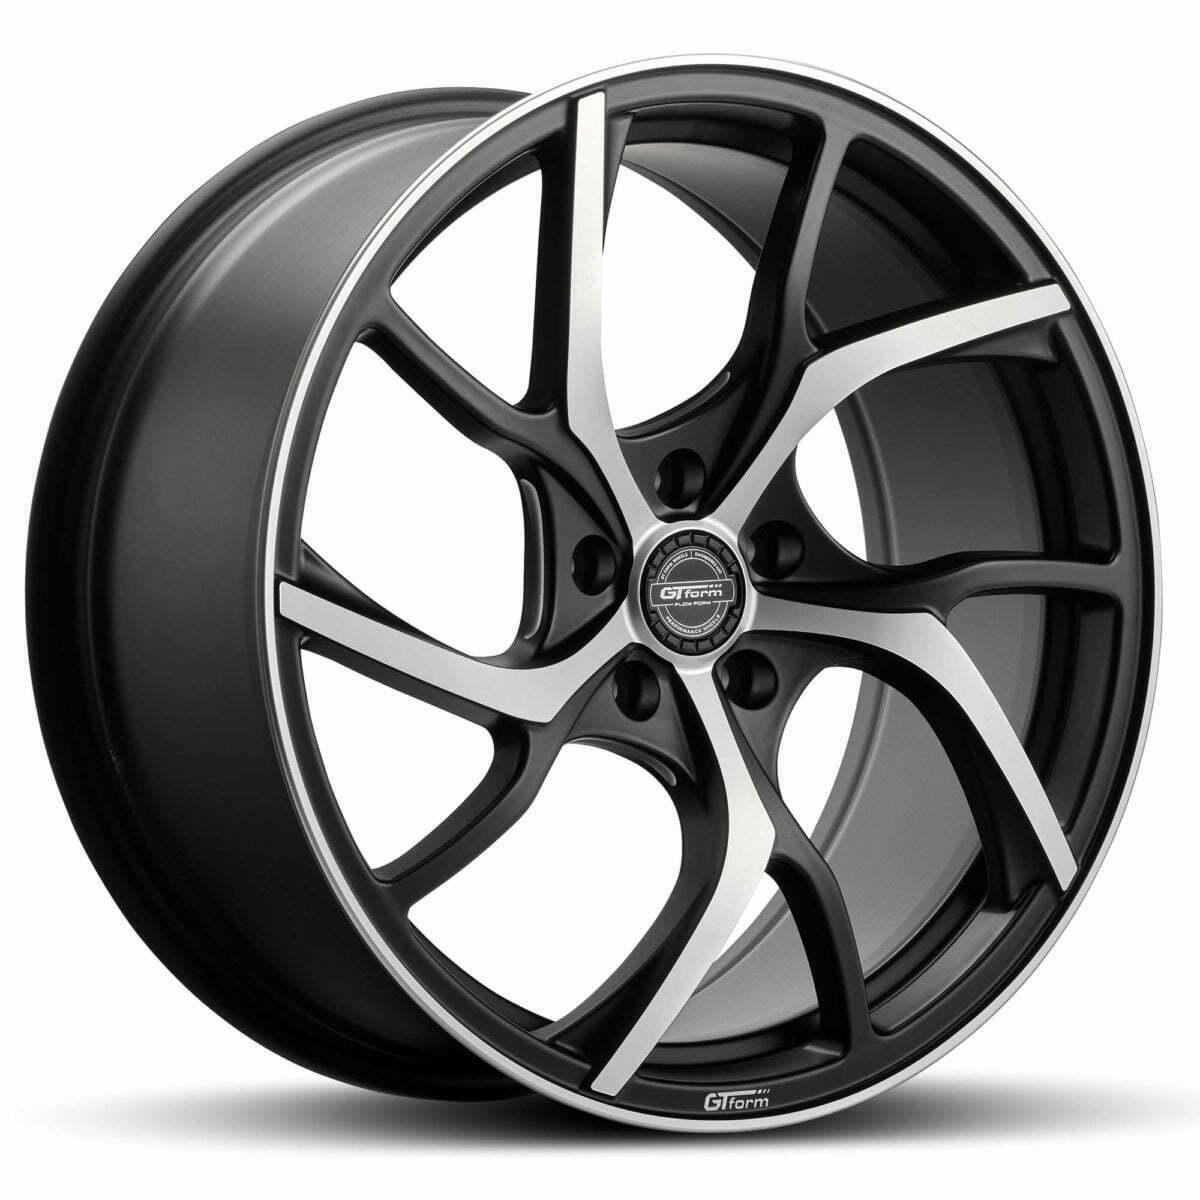 GT form Revert Satin Black Machined Face wheel rim performance wheels